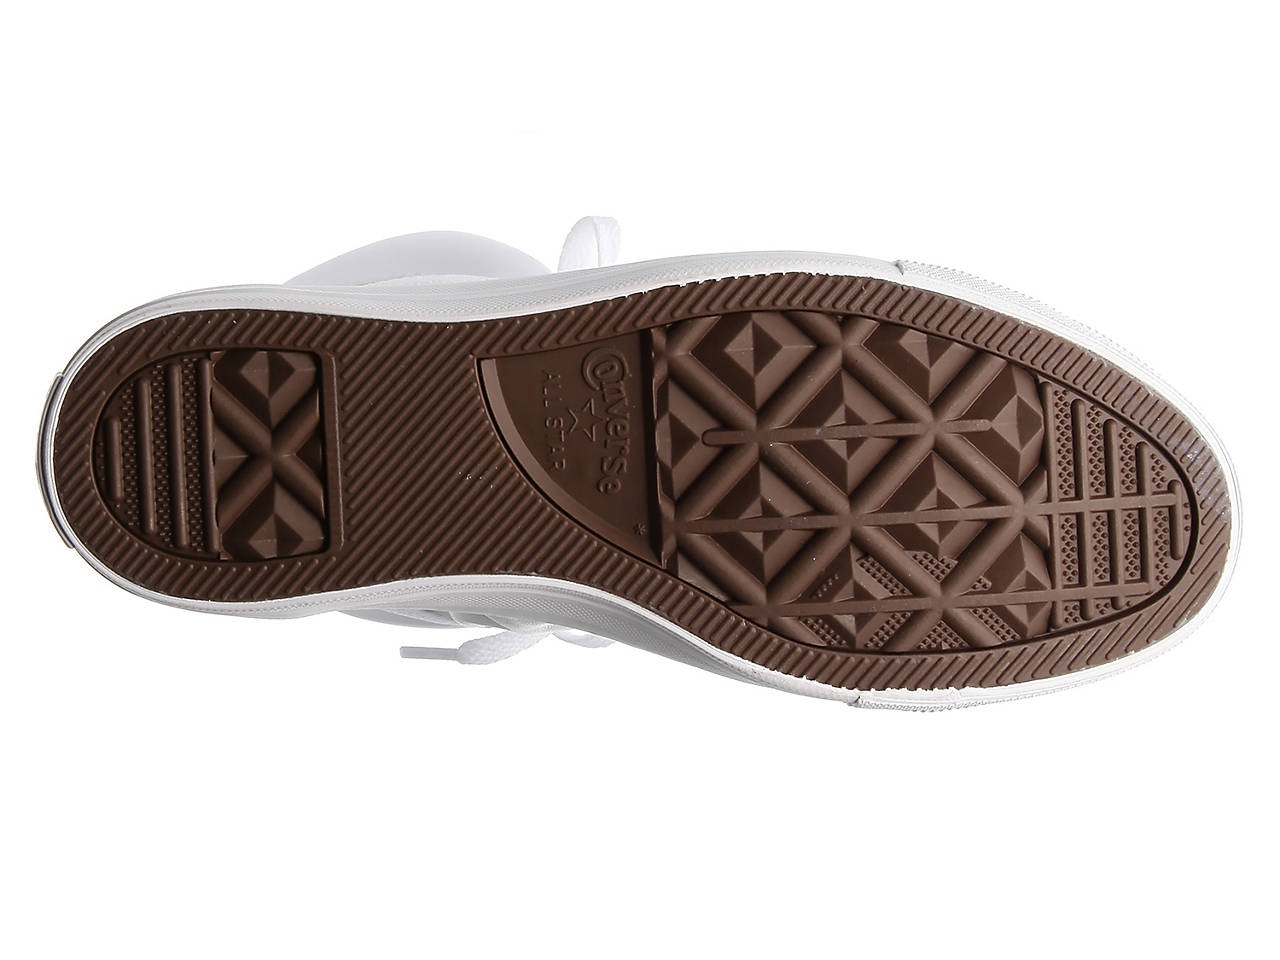 c23f0e5e8a4ced Converse Chuck Taylor All Star Brookline High-Top Sneaker - Women s ...